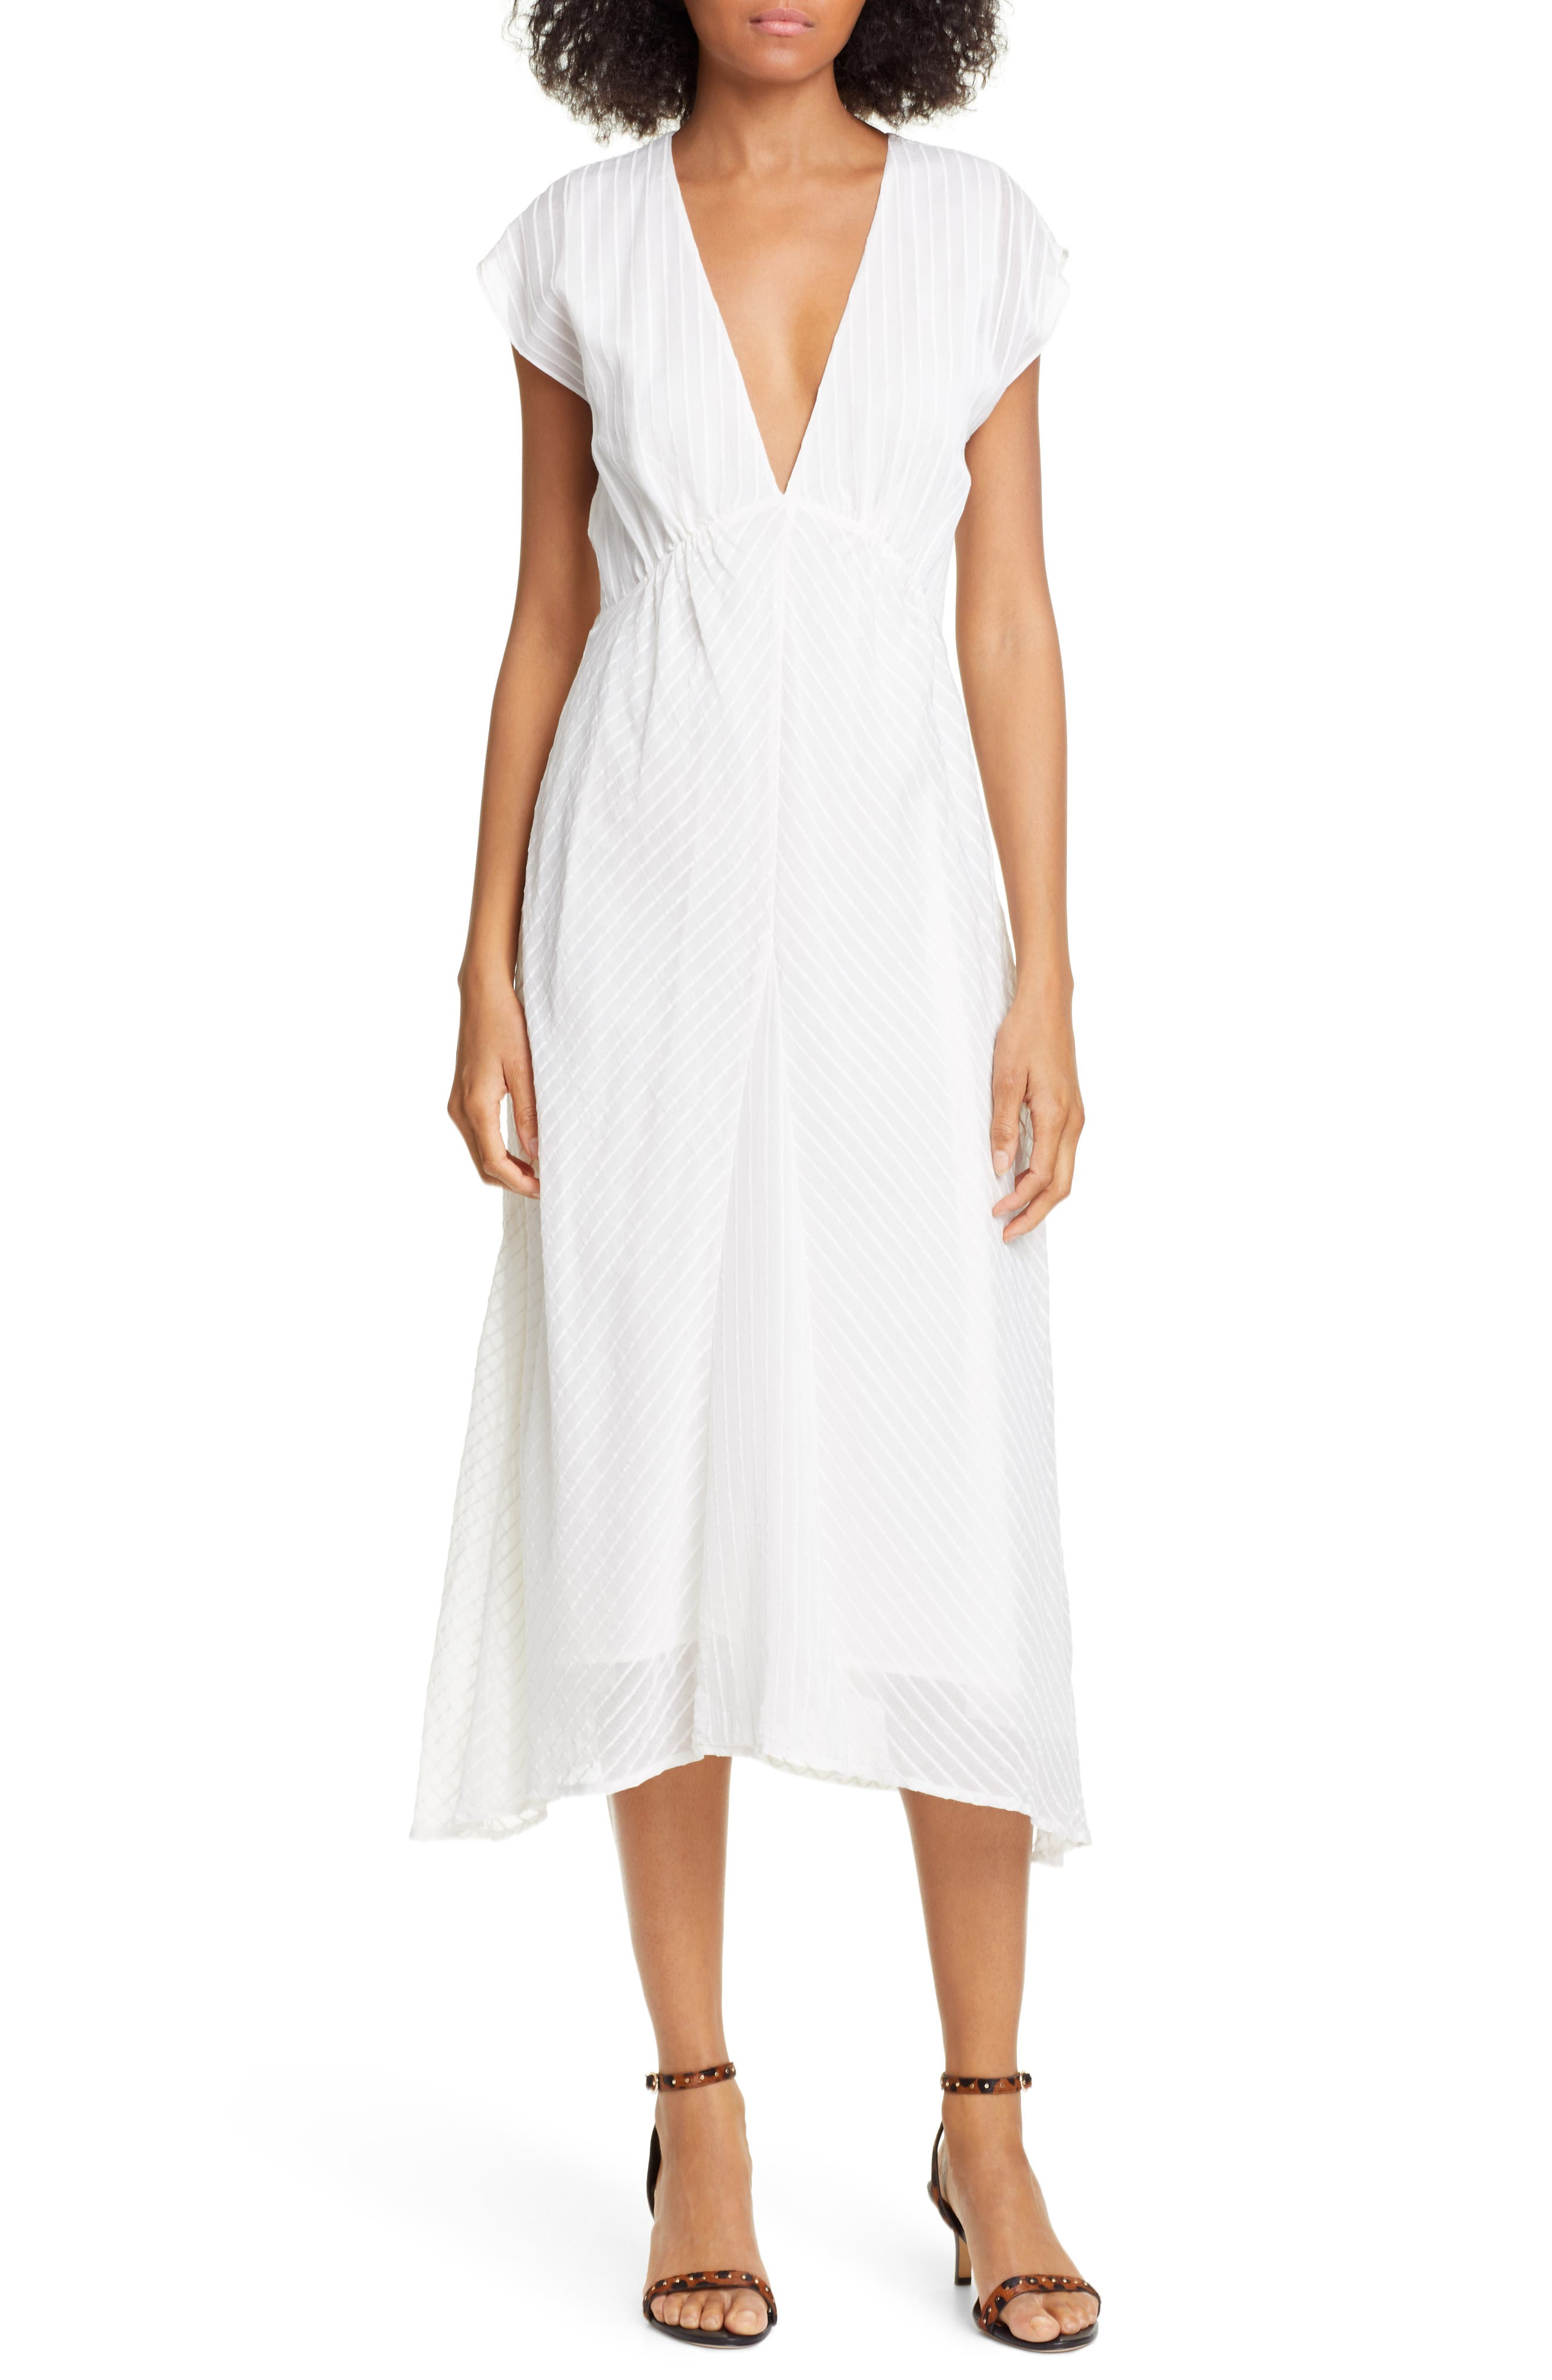 Joie Shaeryl Midi Dress, Ivory